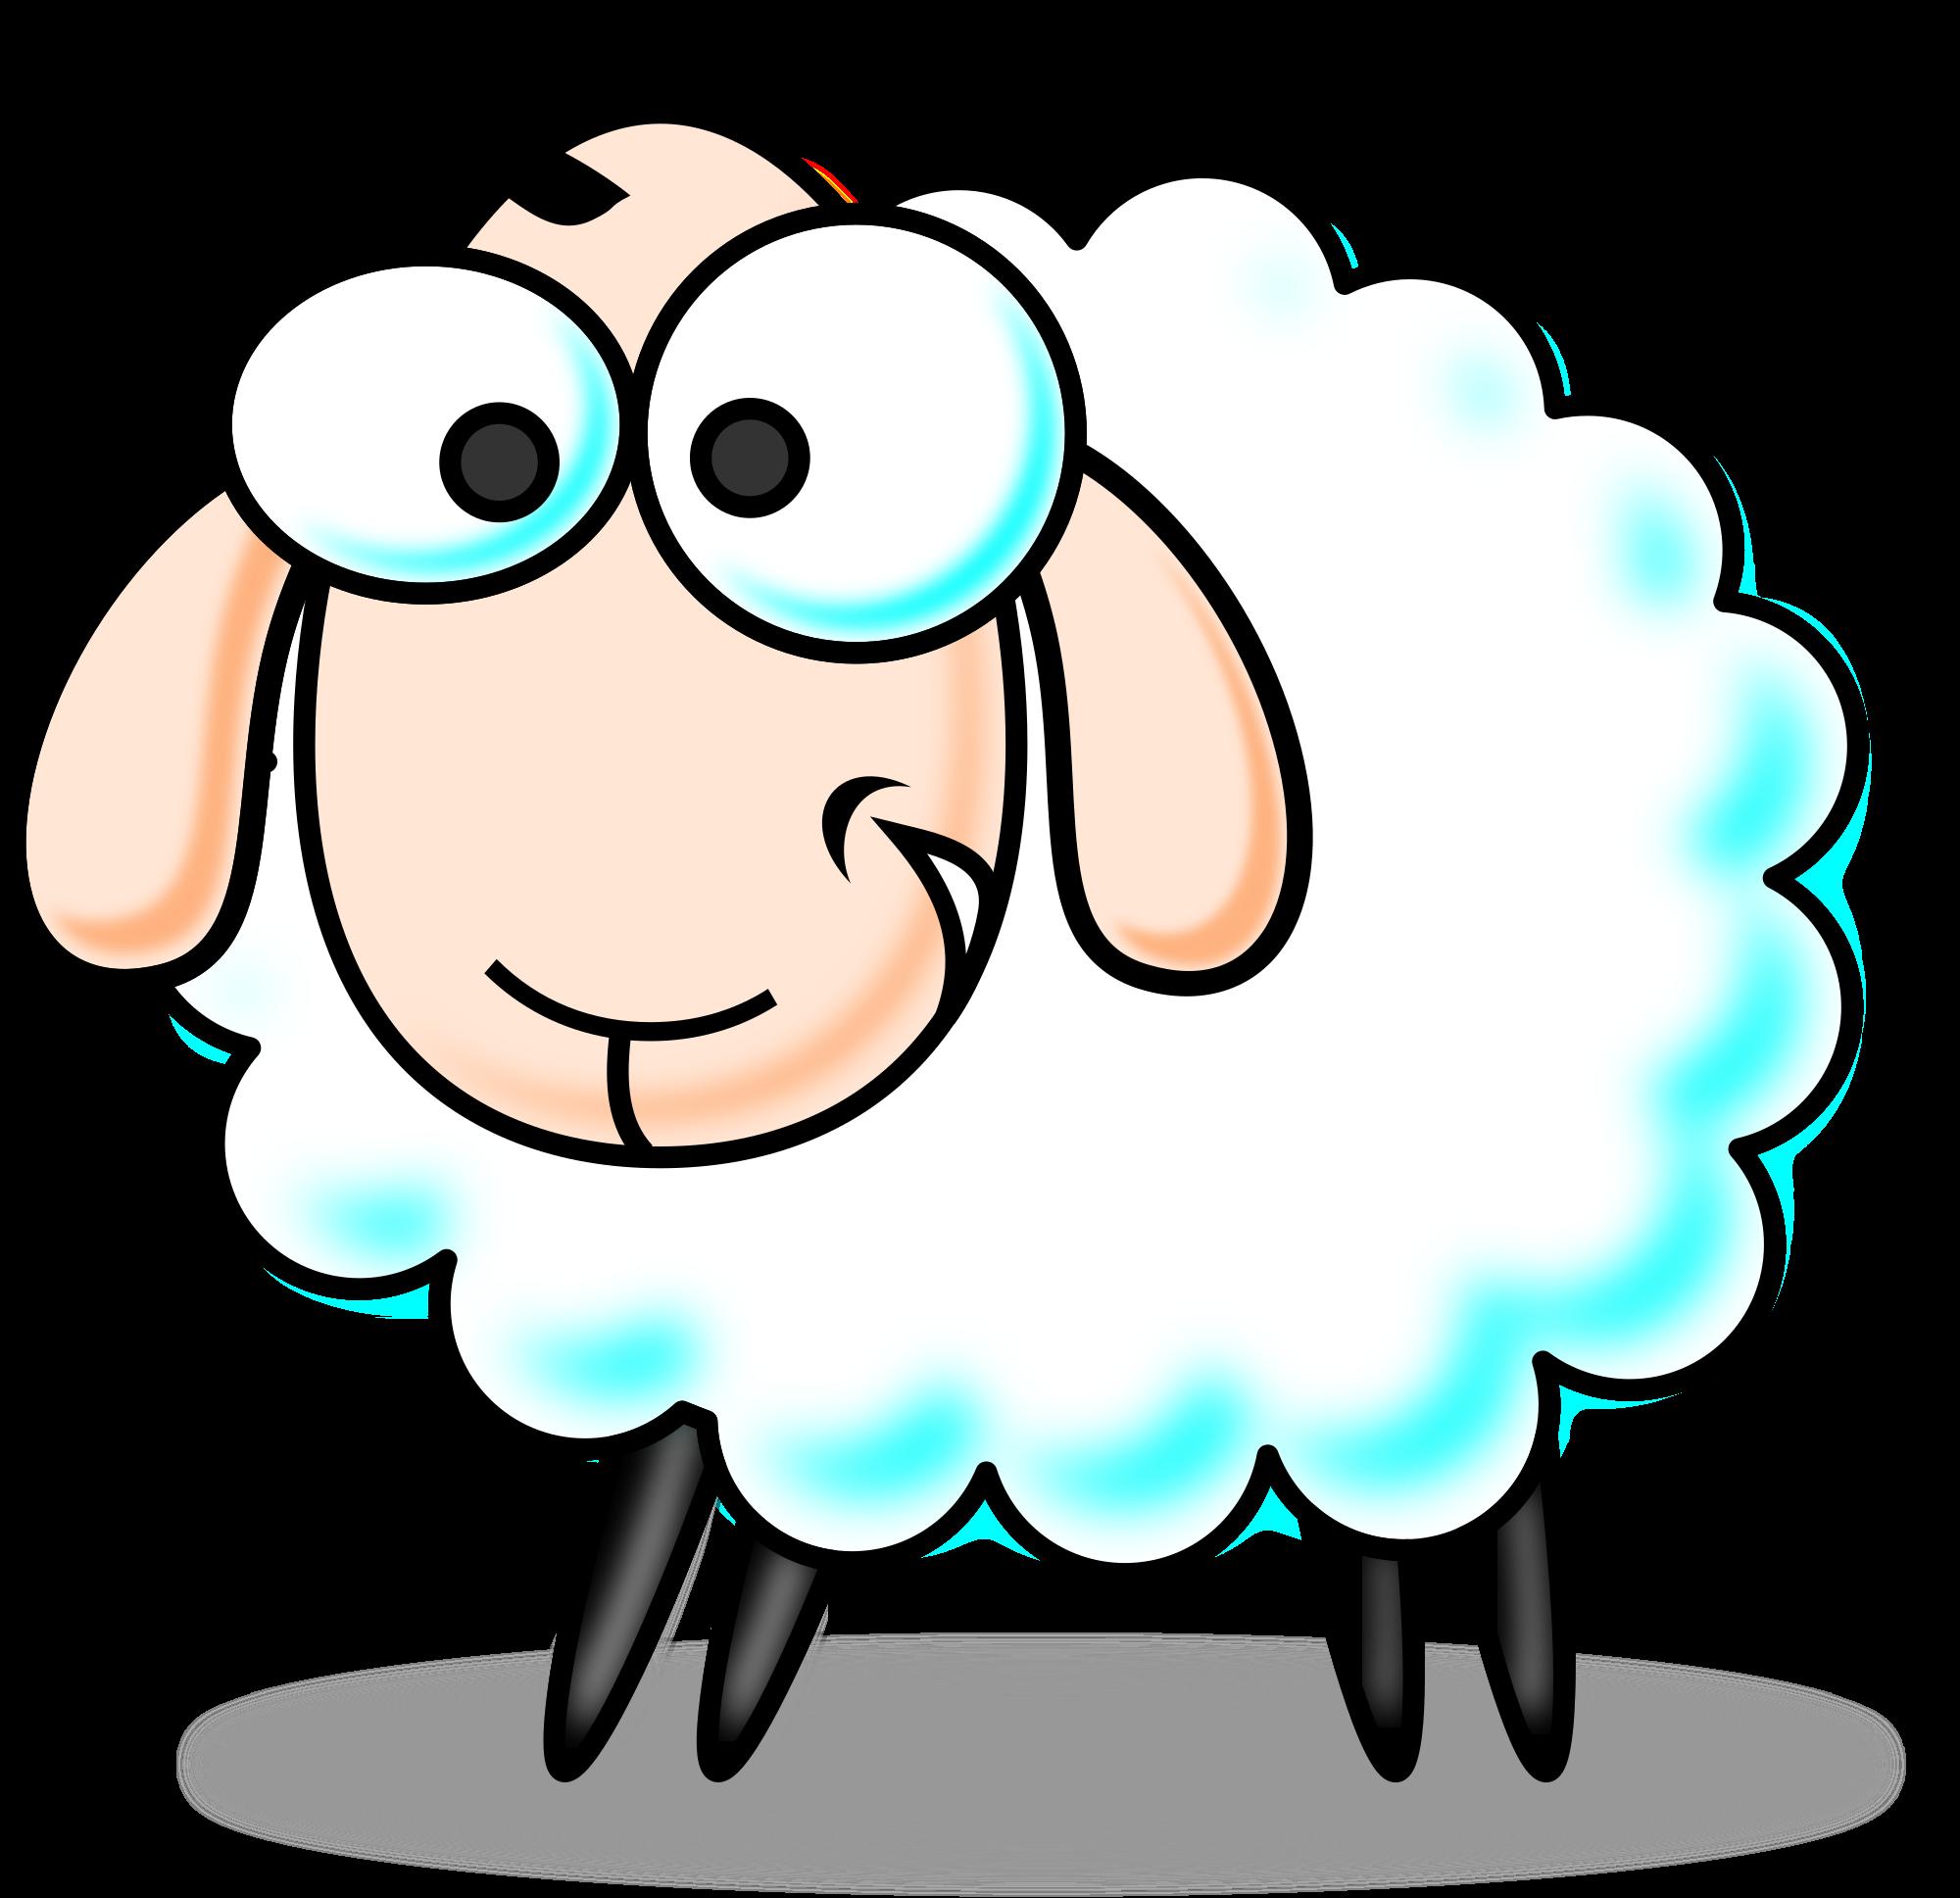 Free cartoon sheep clip art .-Free cartoon sheep clip art .-11